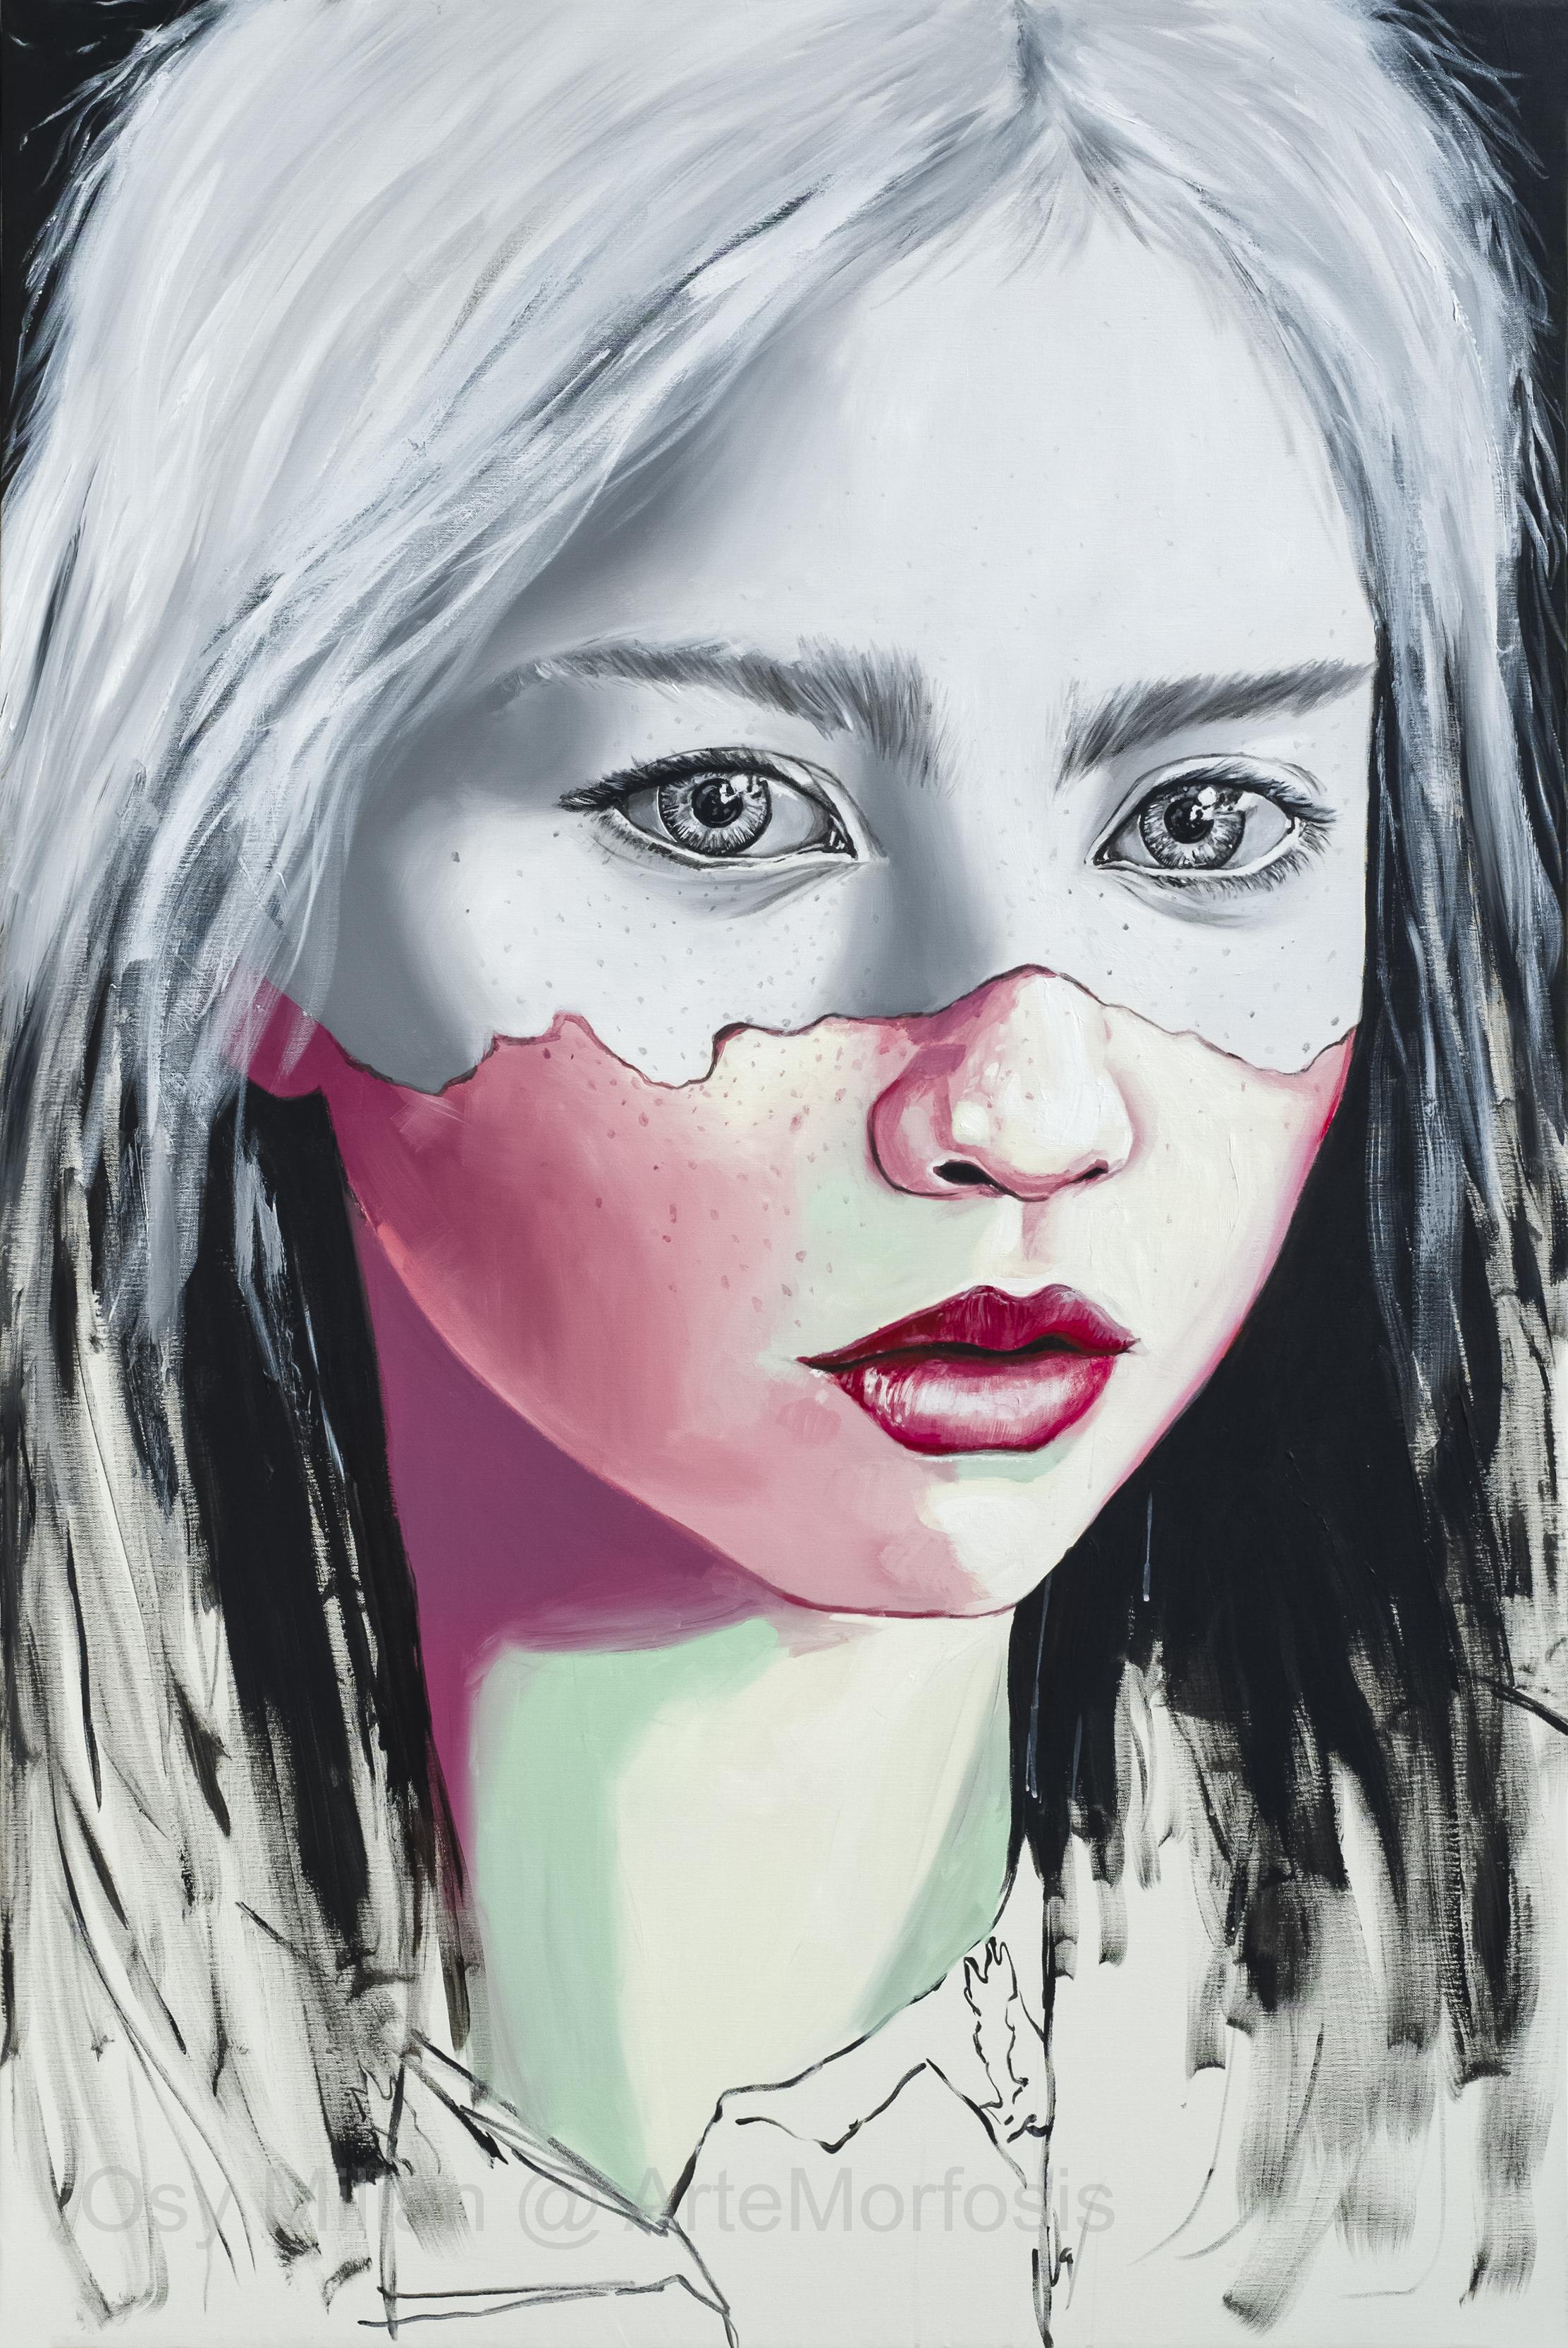 OSY MILIAN - Moi, Acrilico/lienzo, 150 x 100 cm, 2017